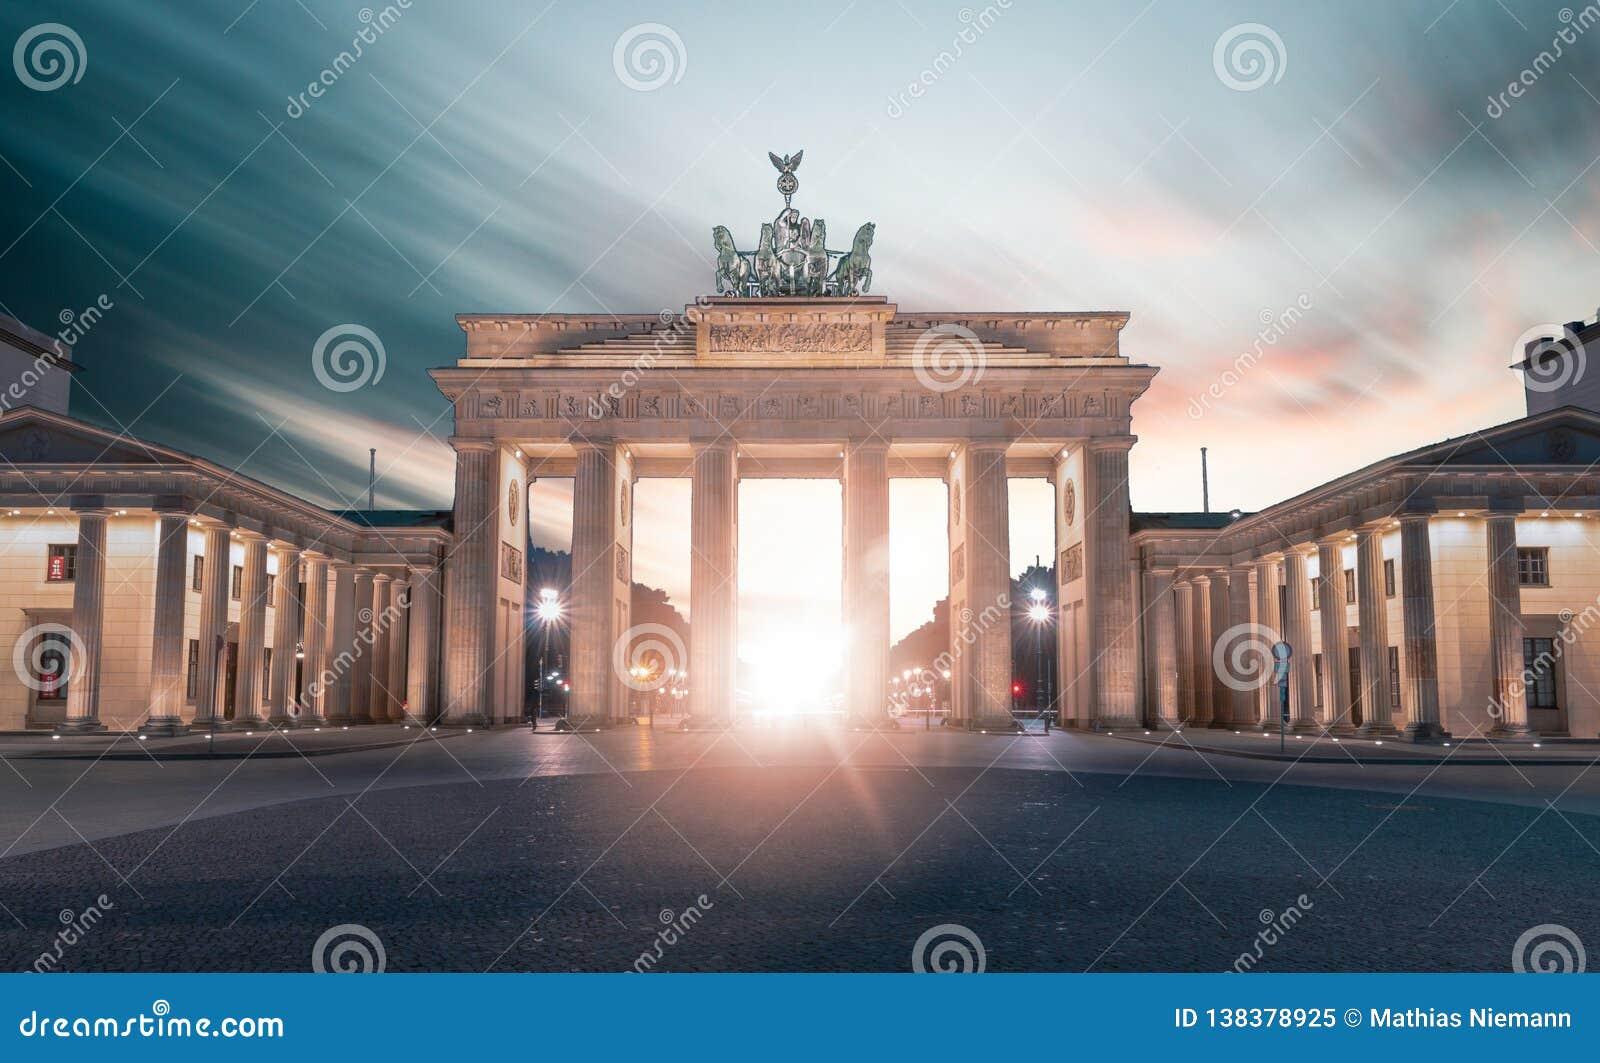 Brandenburger Tor in Berlin, Germany while sunset